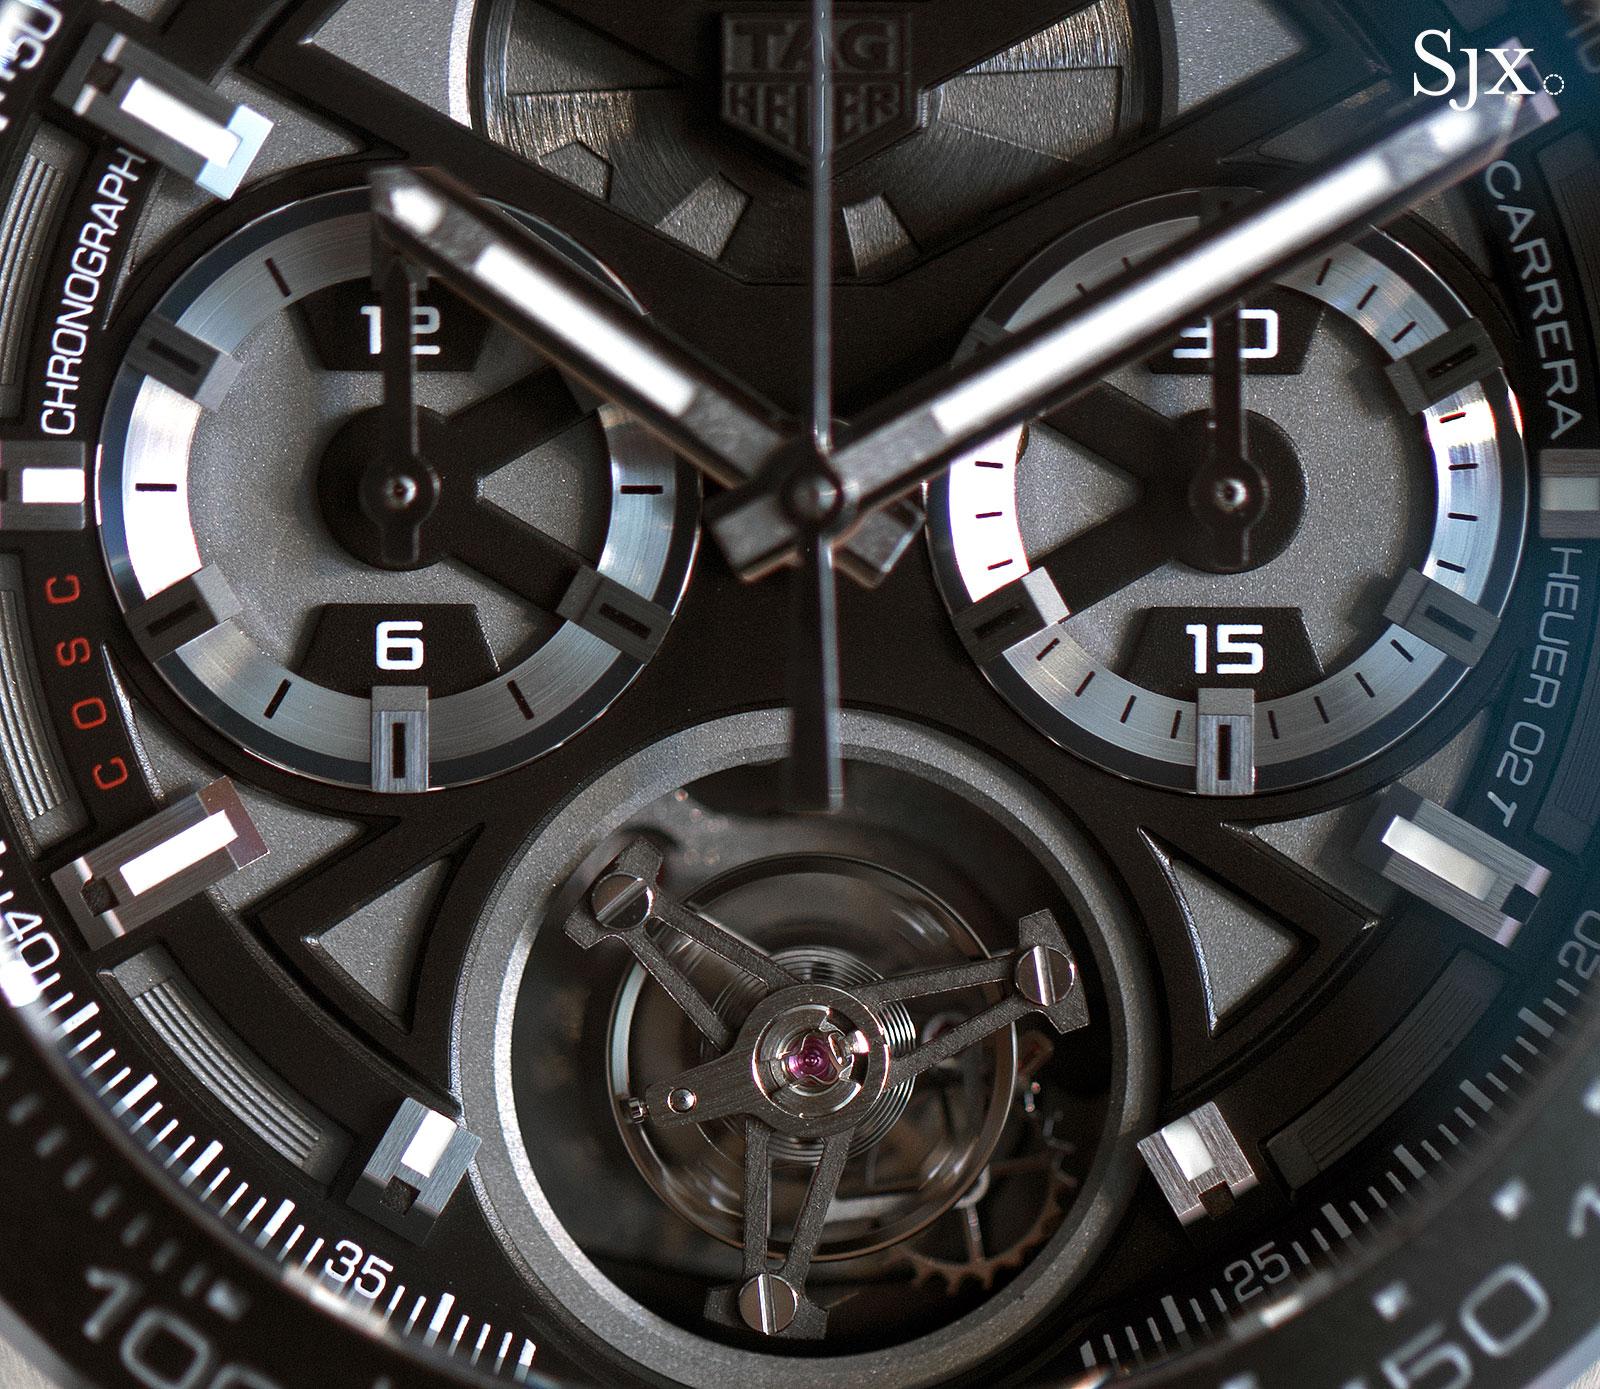 TAG Heuer Carrera Calibre Heuer 02T tourbillon chronograph